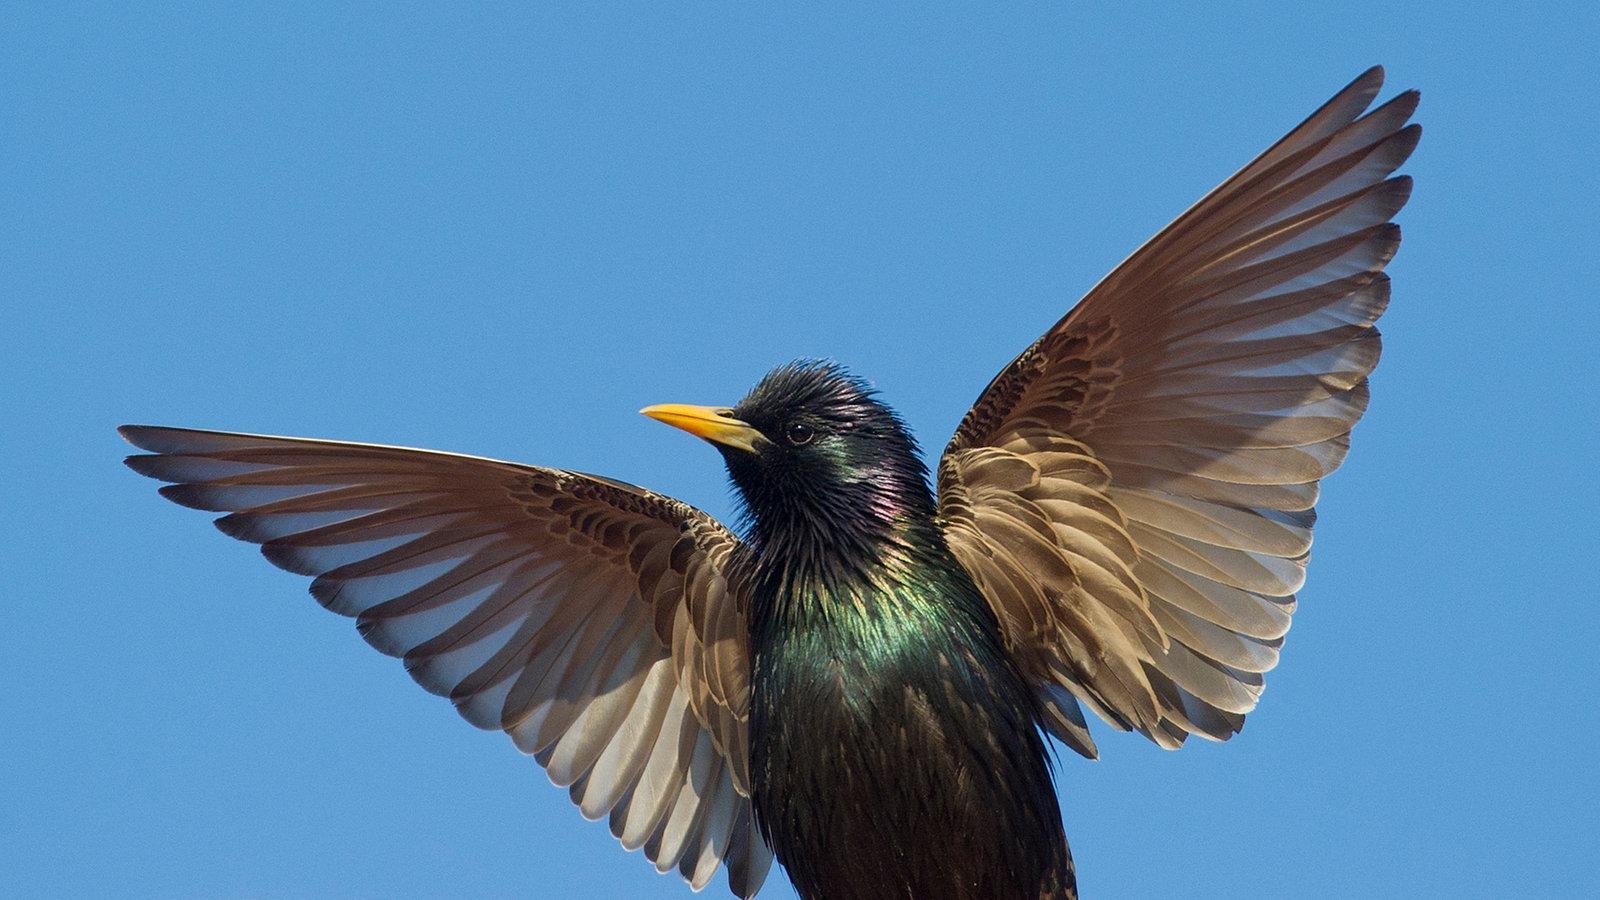 Star Vogel Bilder